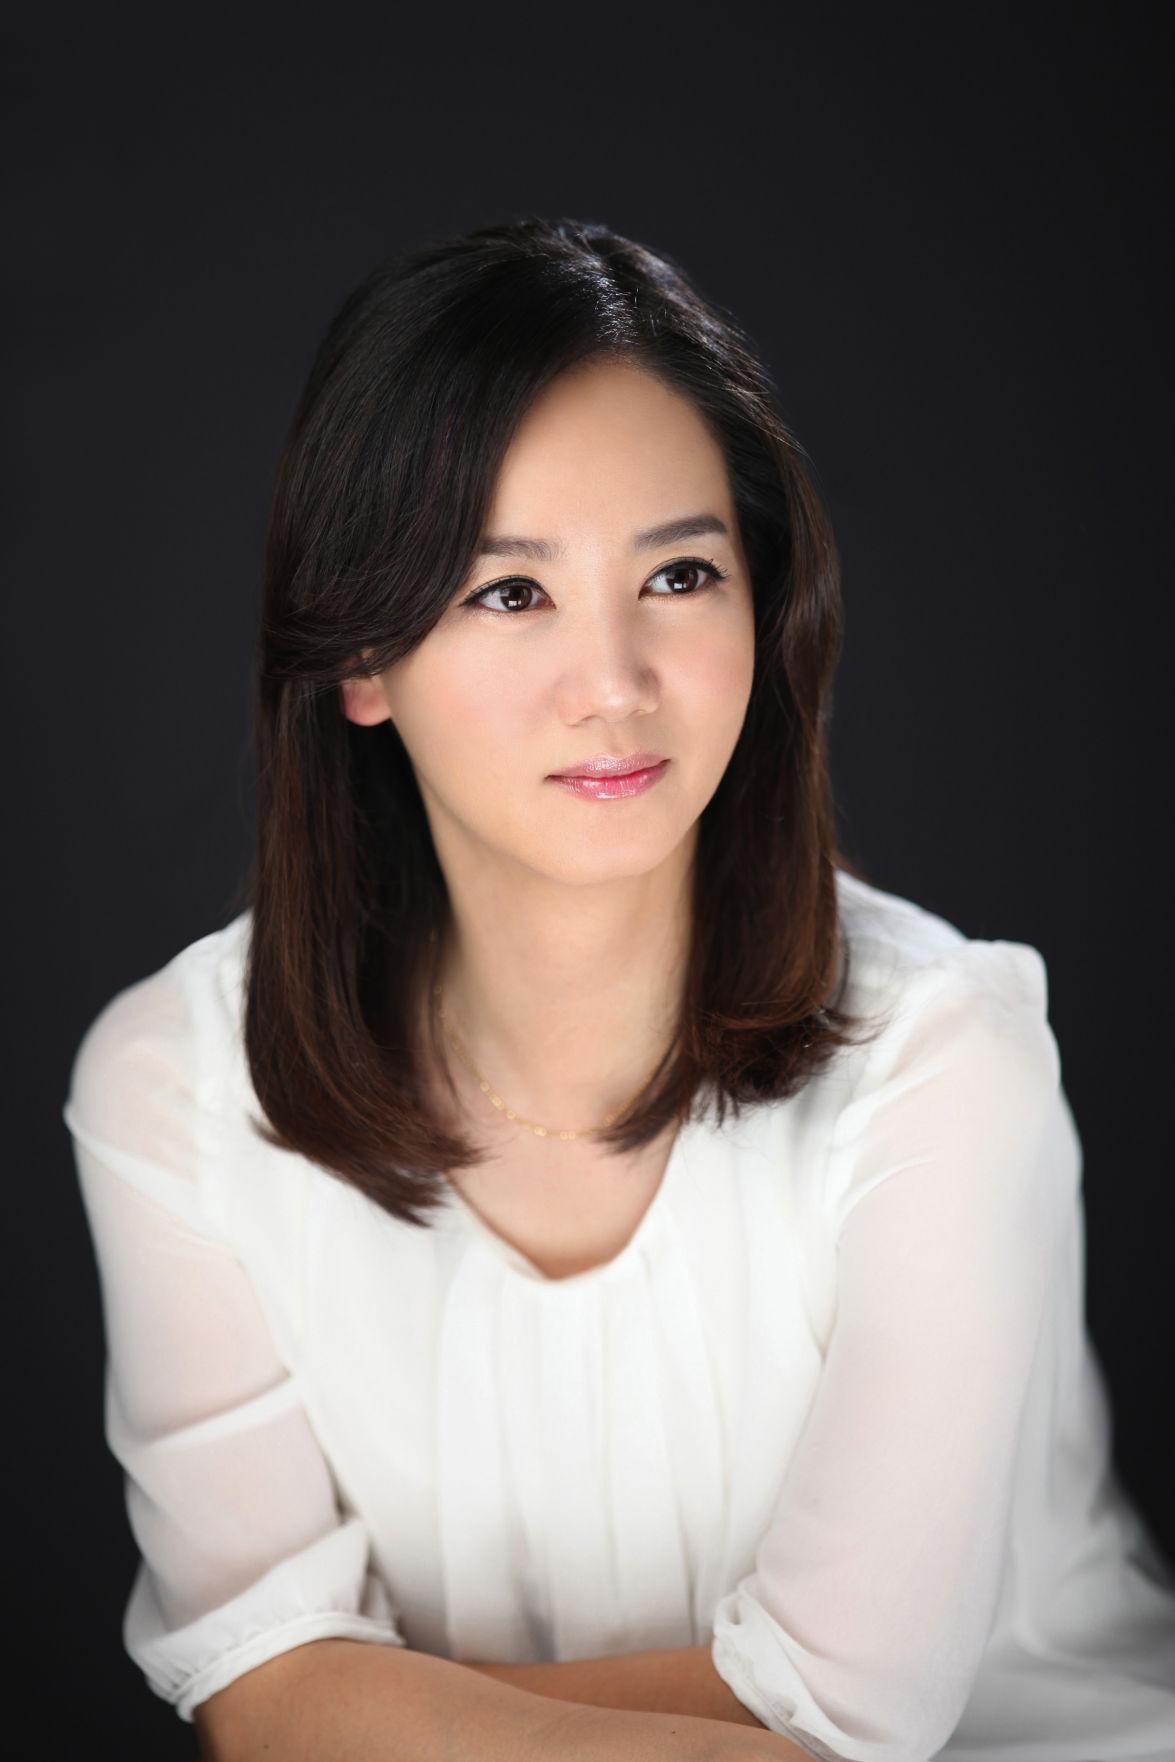 Soo-Yeon Park